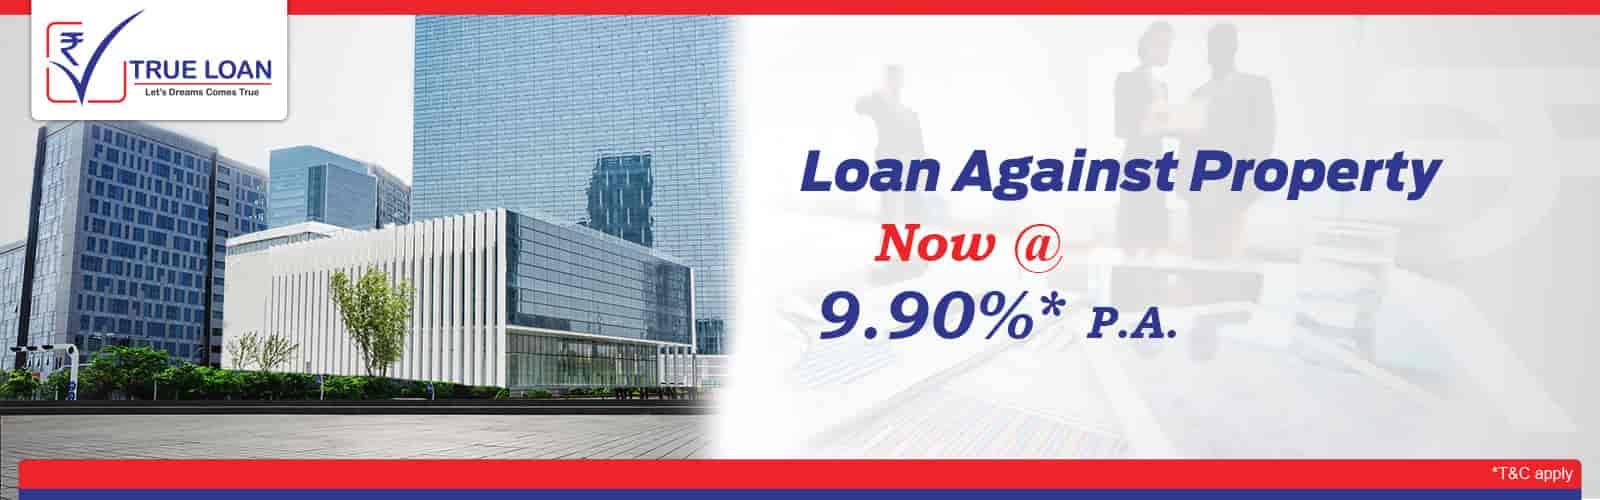 Cash loan atlanta image 10